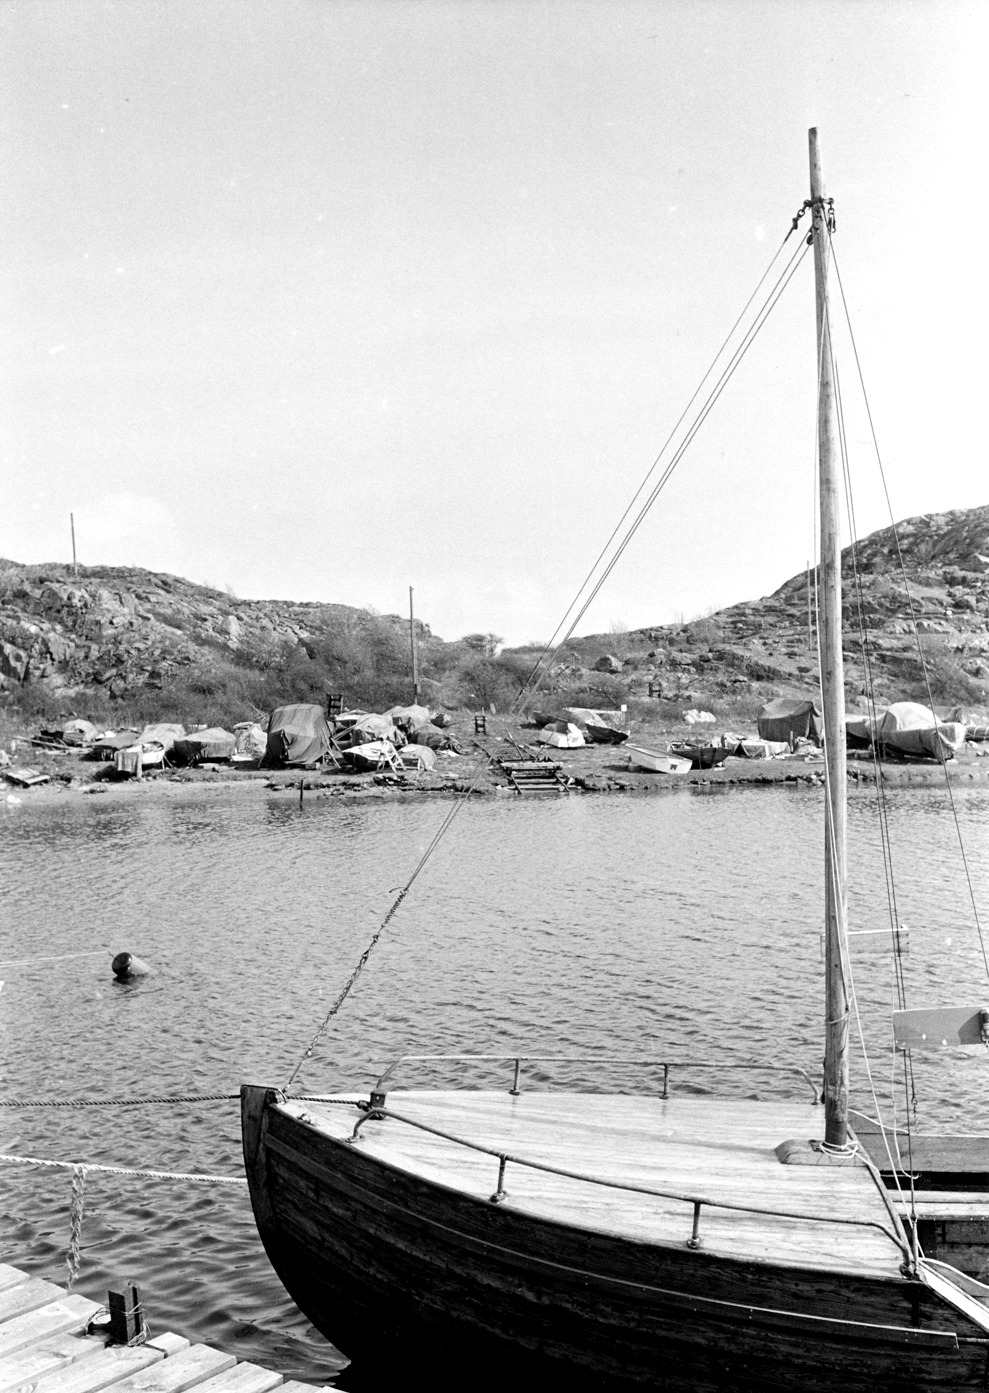 Foto Claes Funck 1968. Upplagda båtar för småfiske på Kalven. Norsk snipa, Trion H Henriksson.